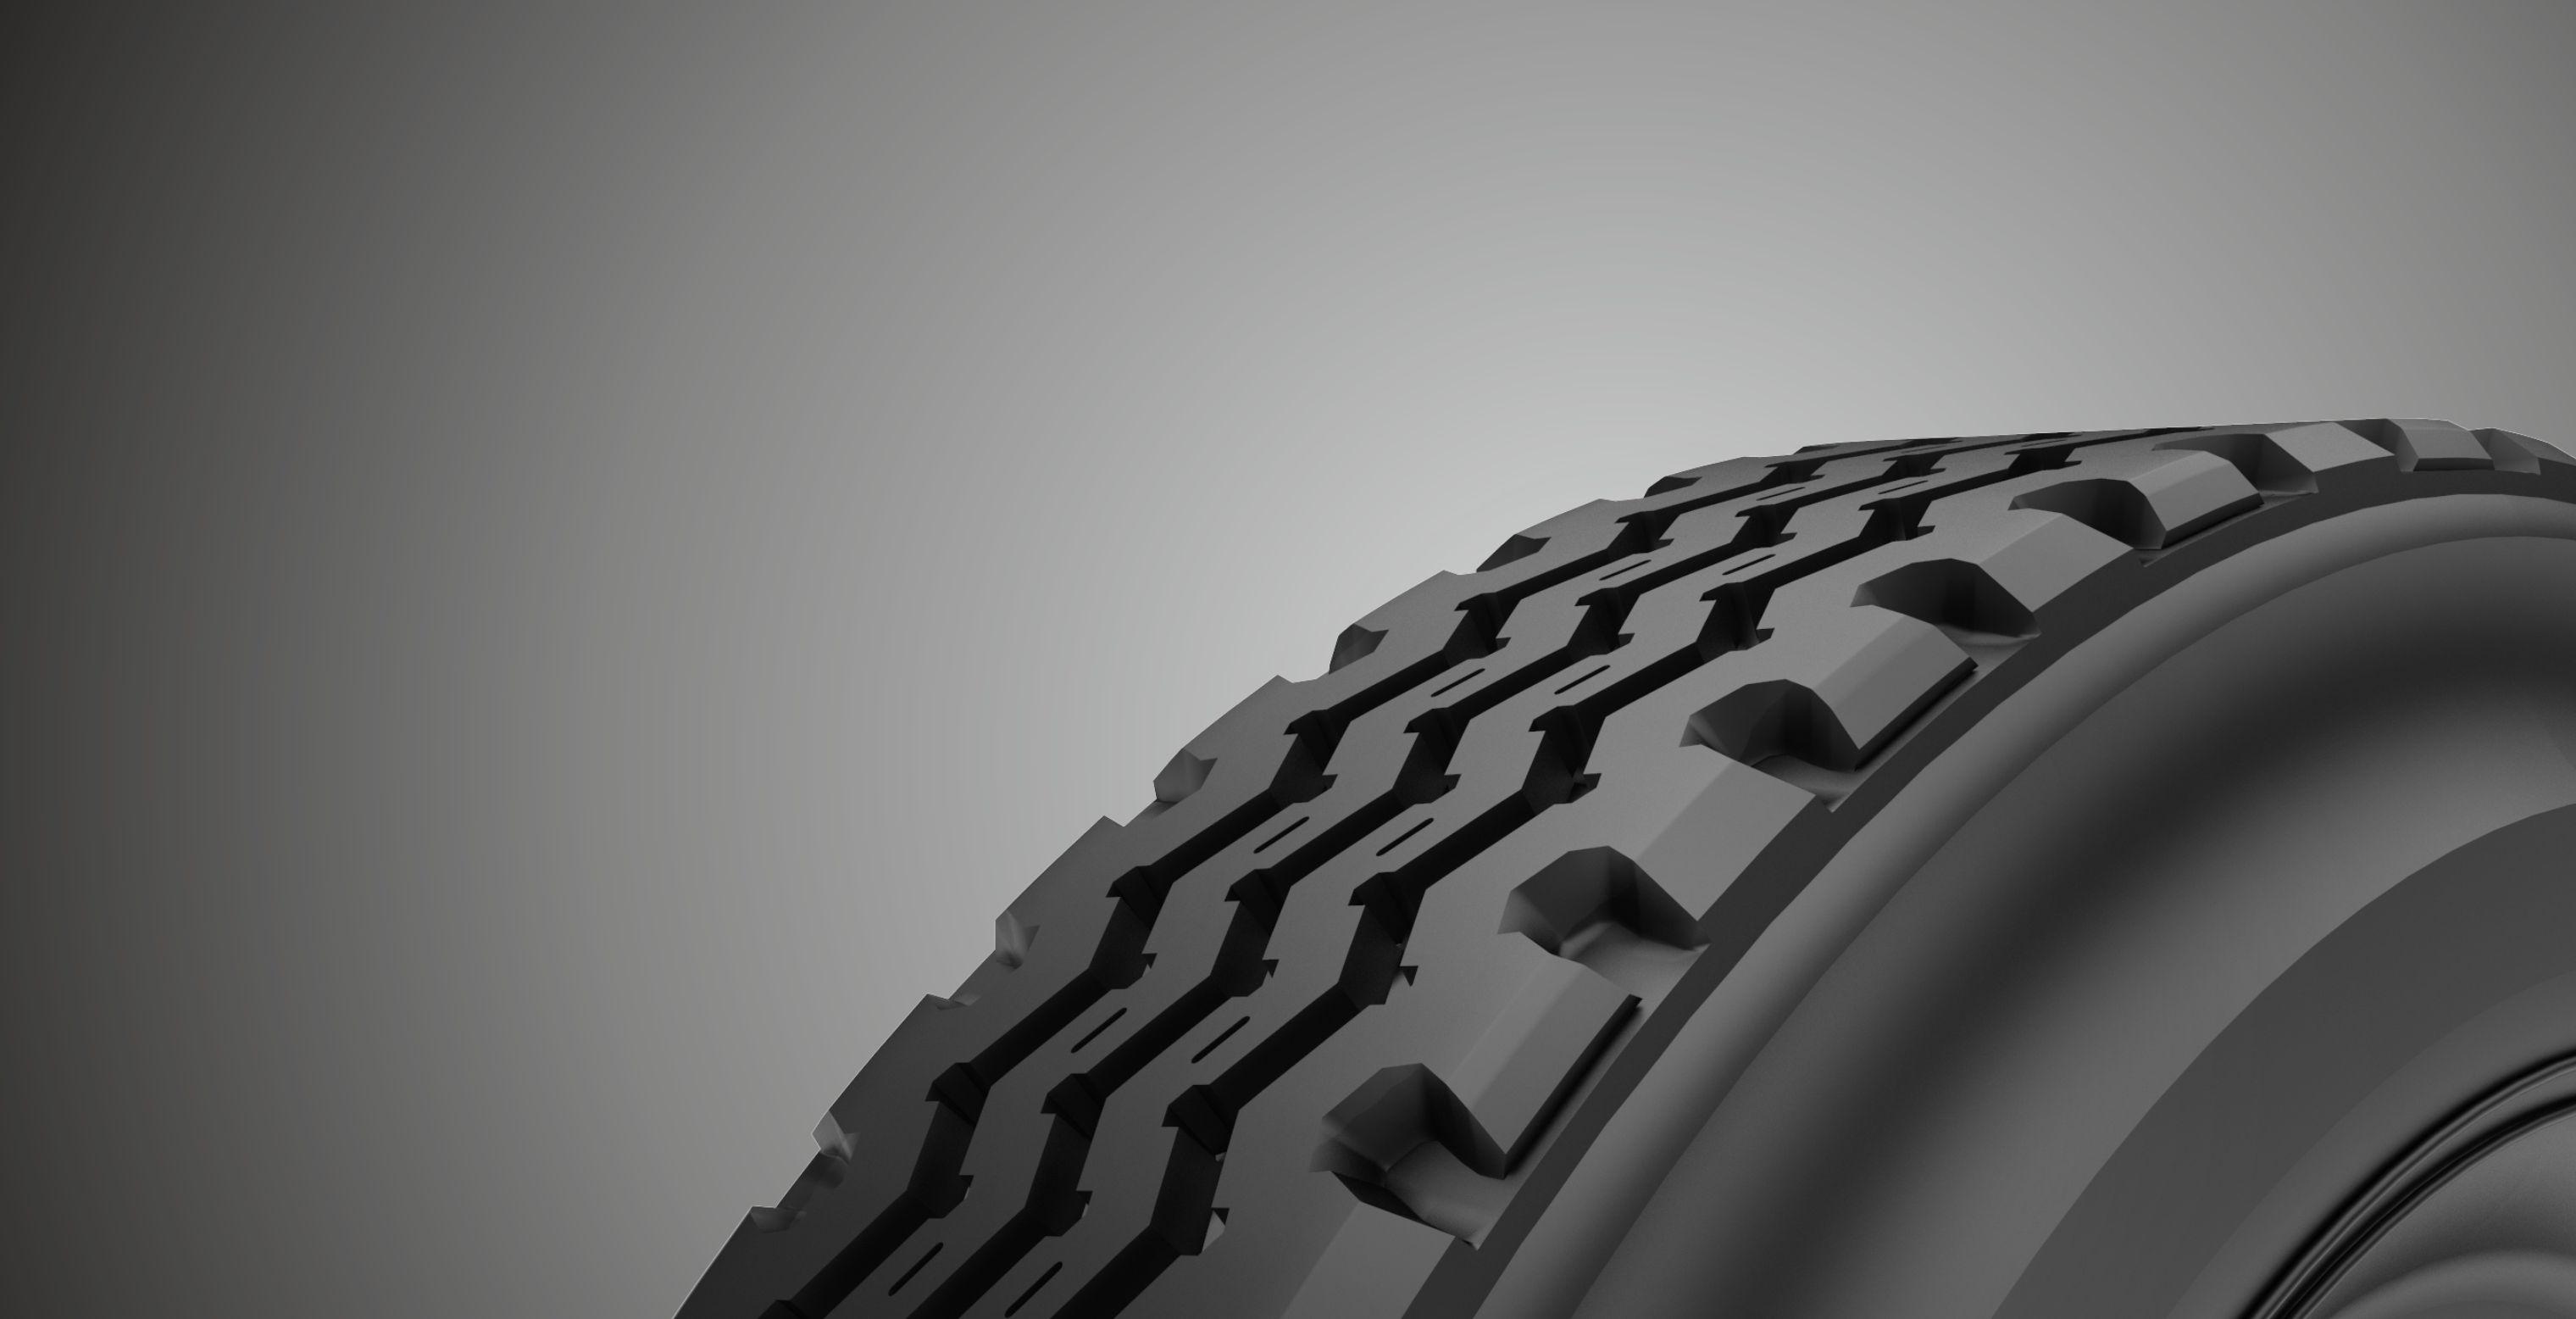 Truck tyre Tread